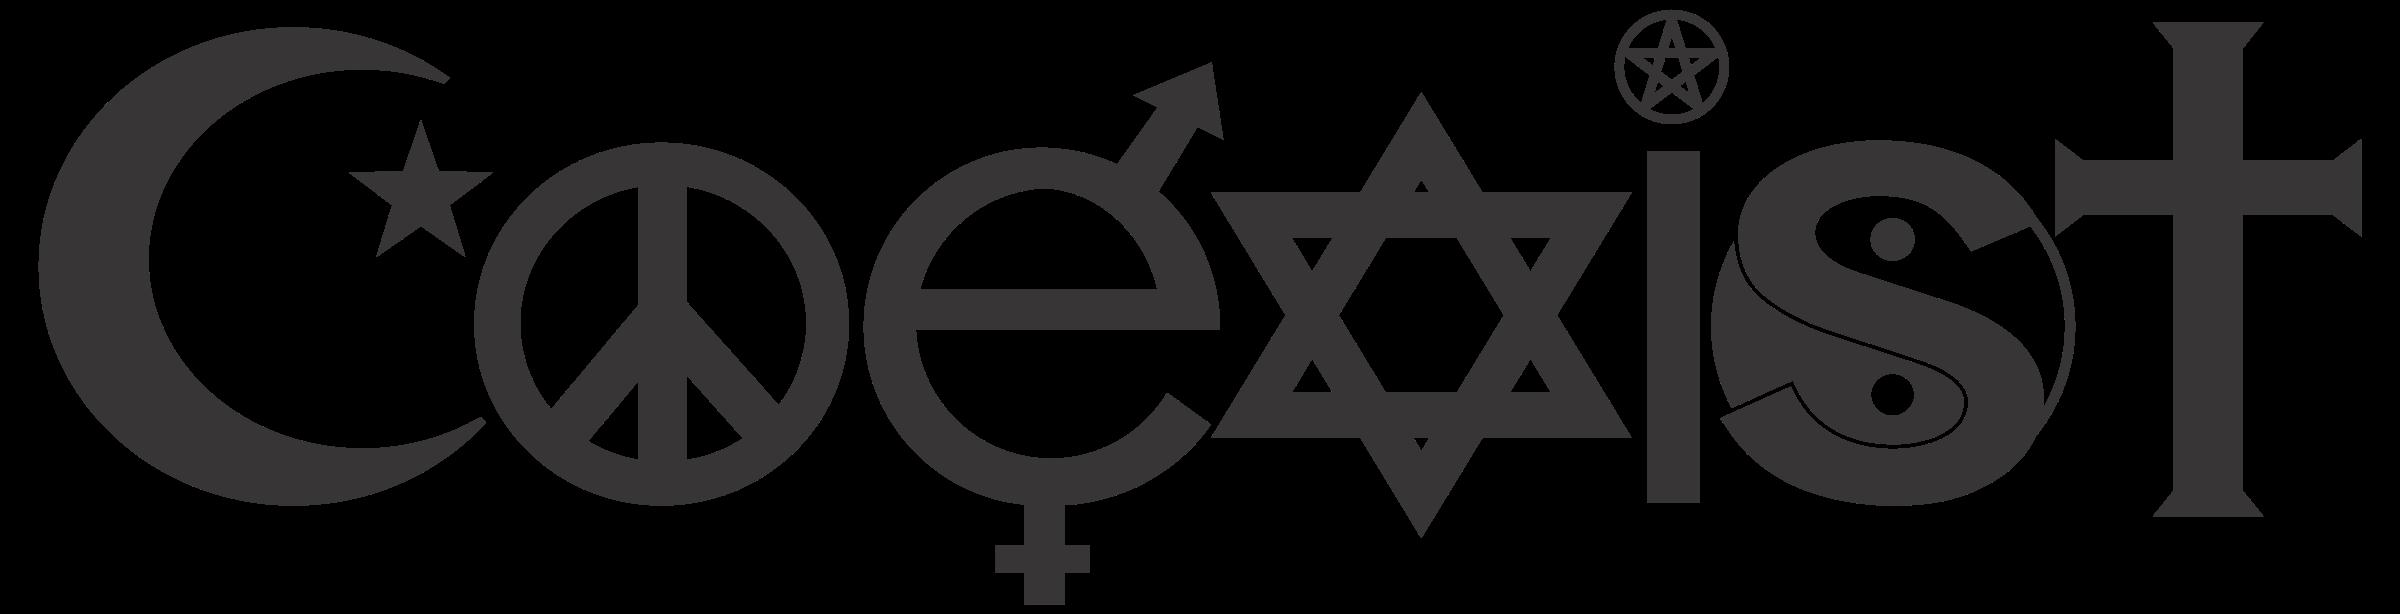 Coeist text font logo black and white